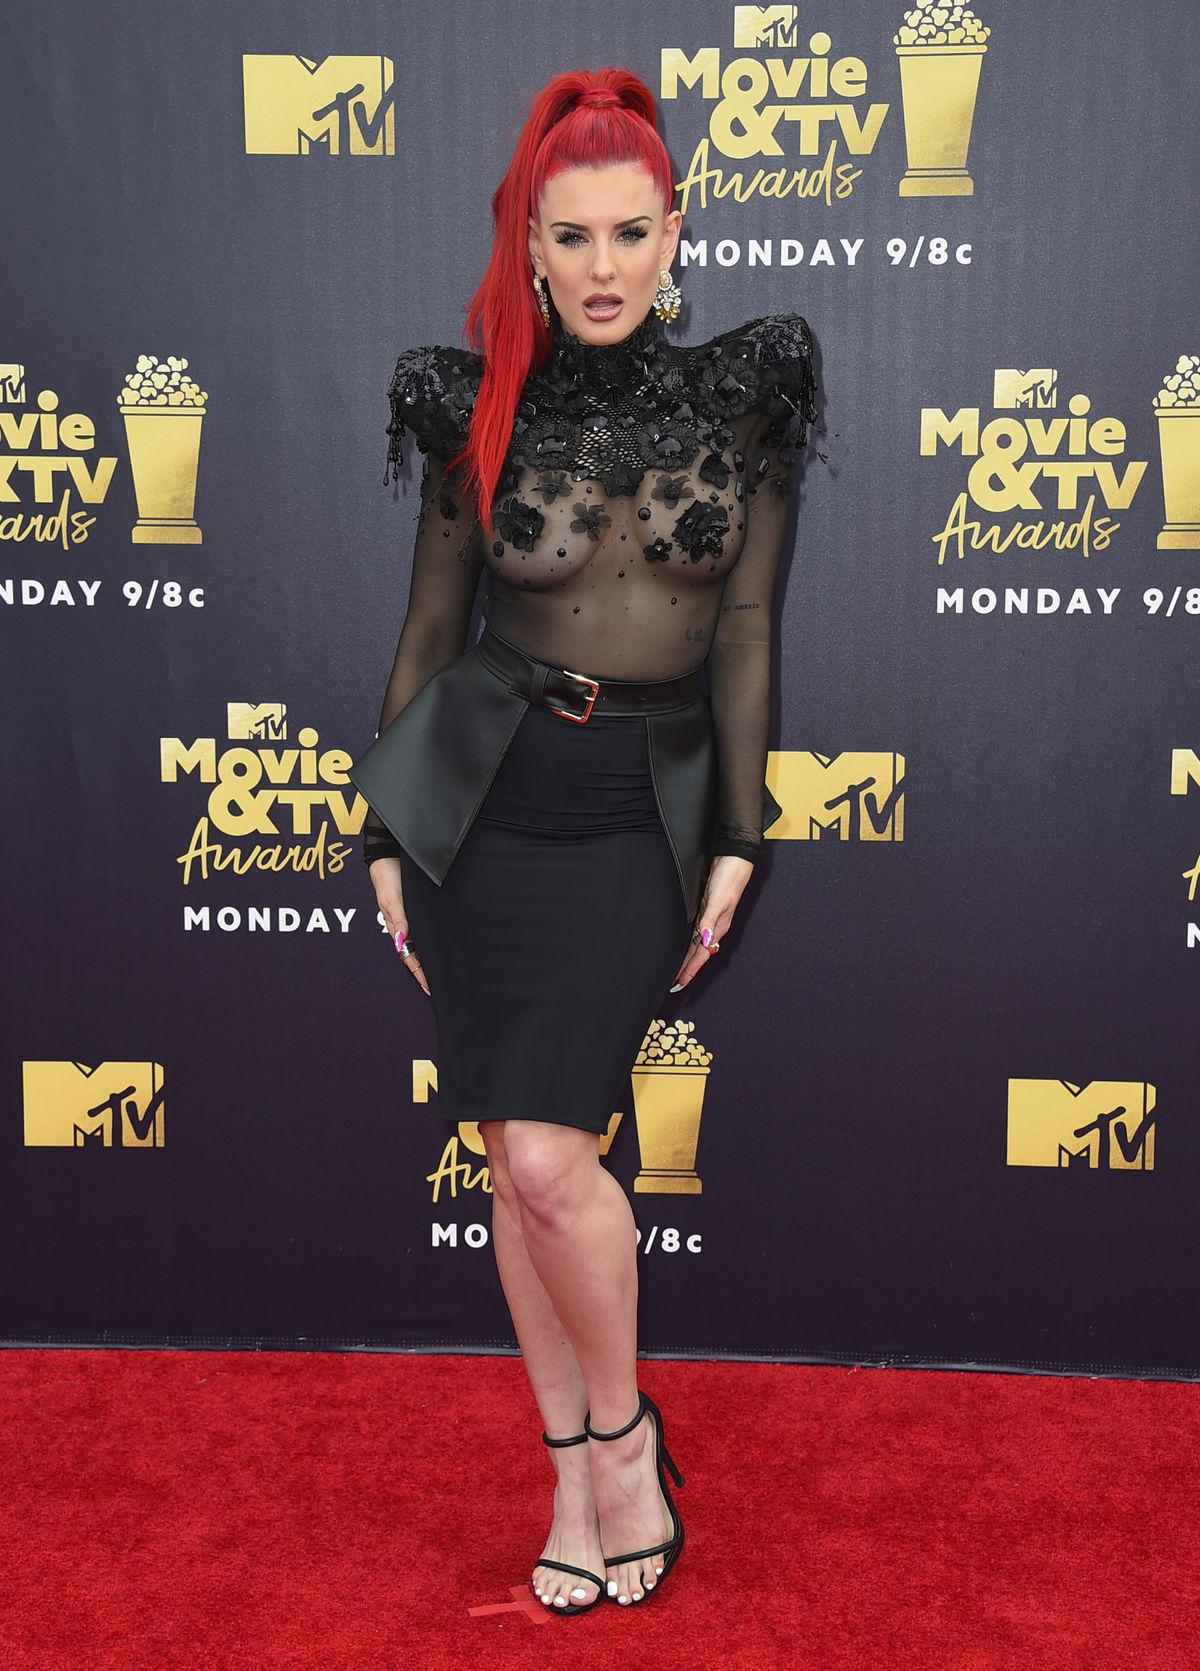 0e1b92d2ec70 Móda hviezd na cenách MTV  Kardashianka či Munn